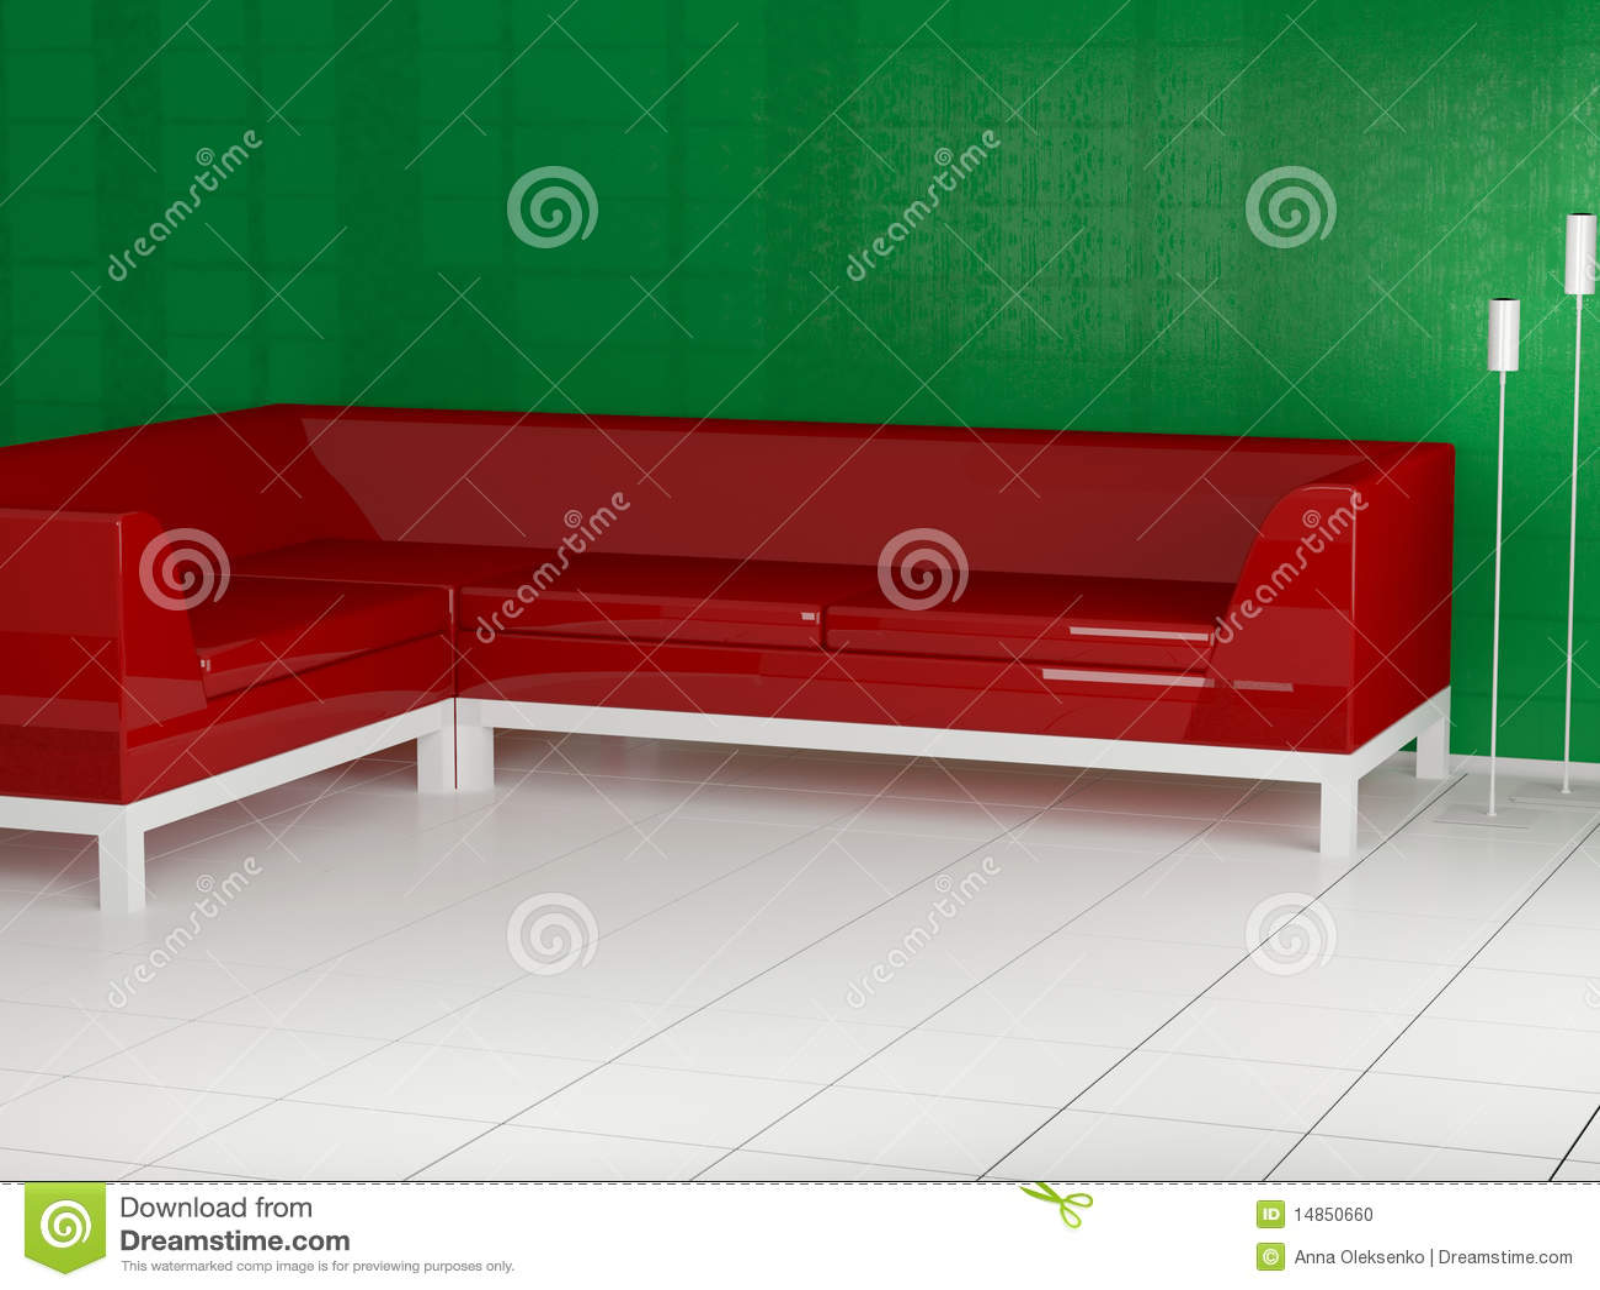 Rotes sofa im raum 3d stockfoto bild 14850660 for Sofa im raum